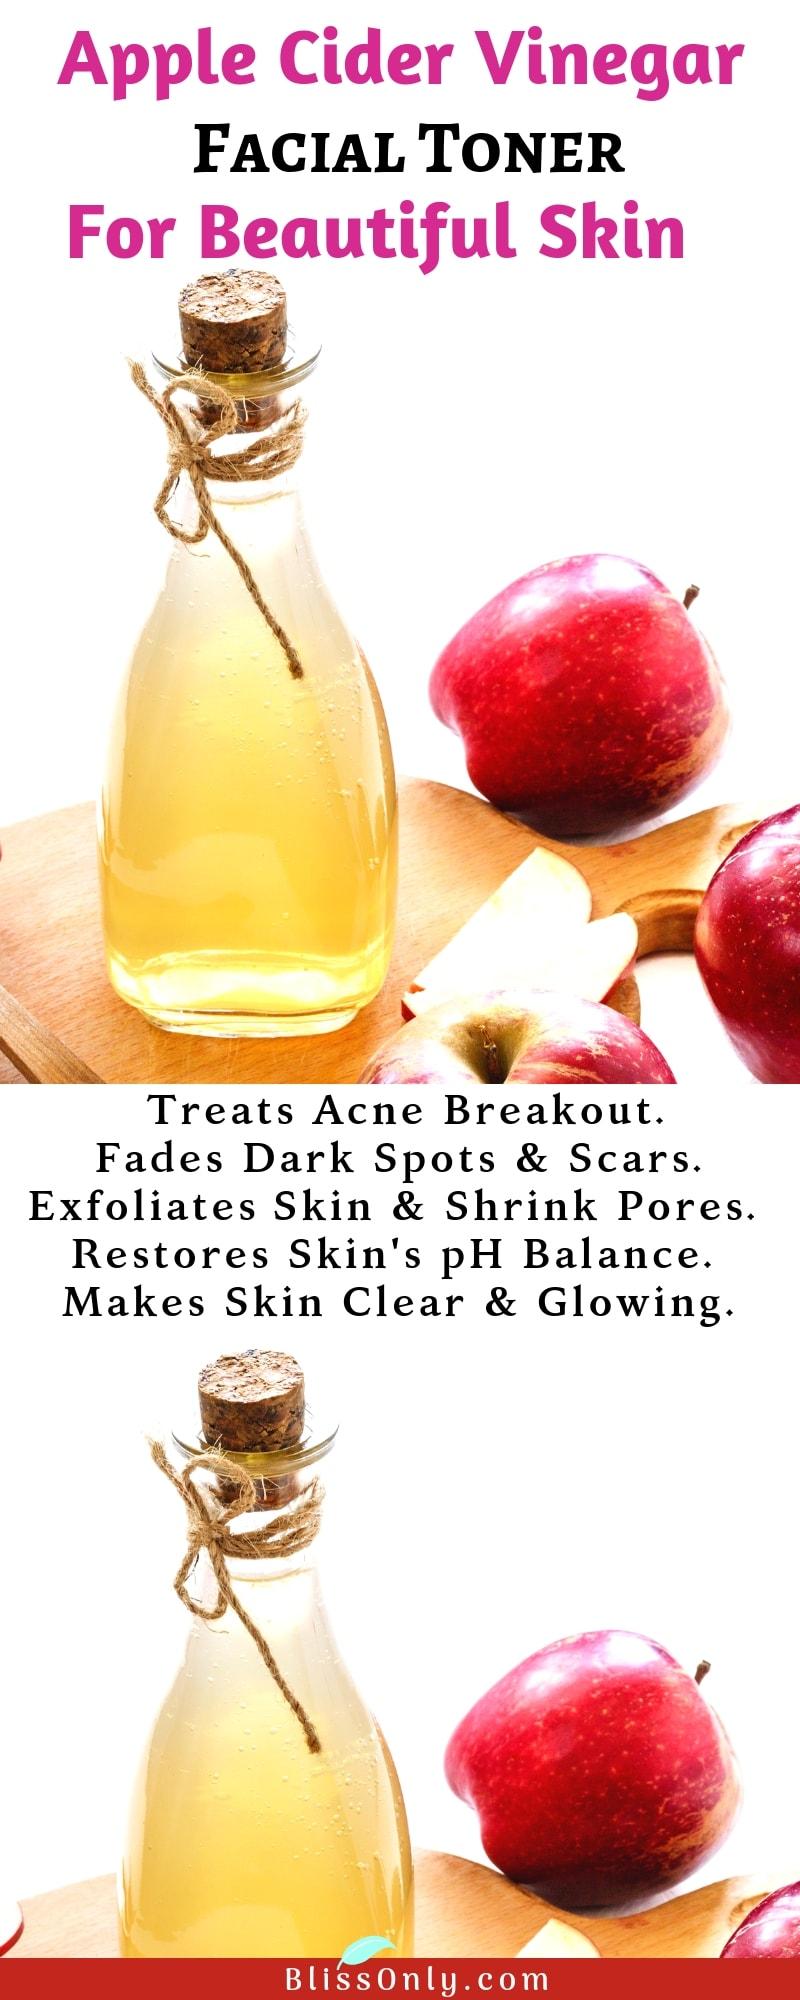 apple cider vinegar face toner